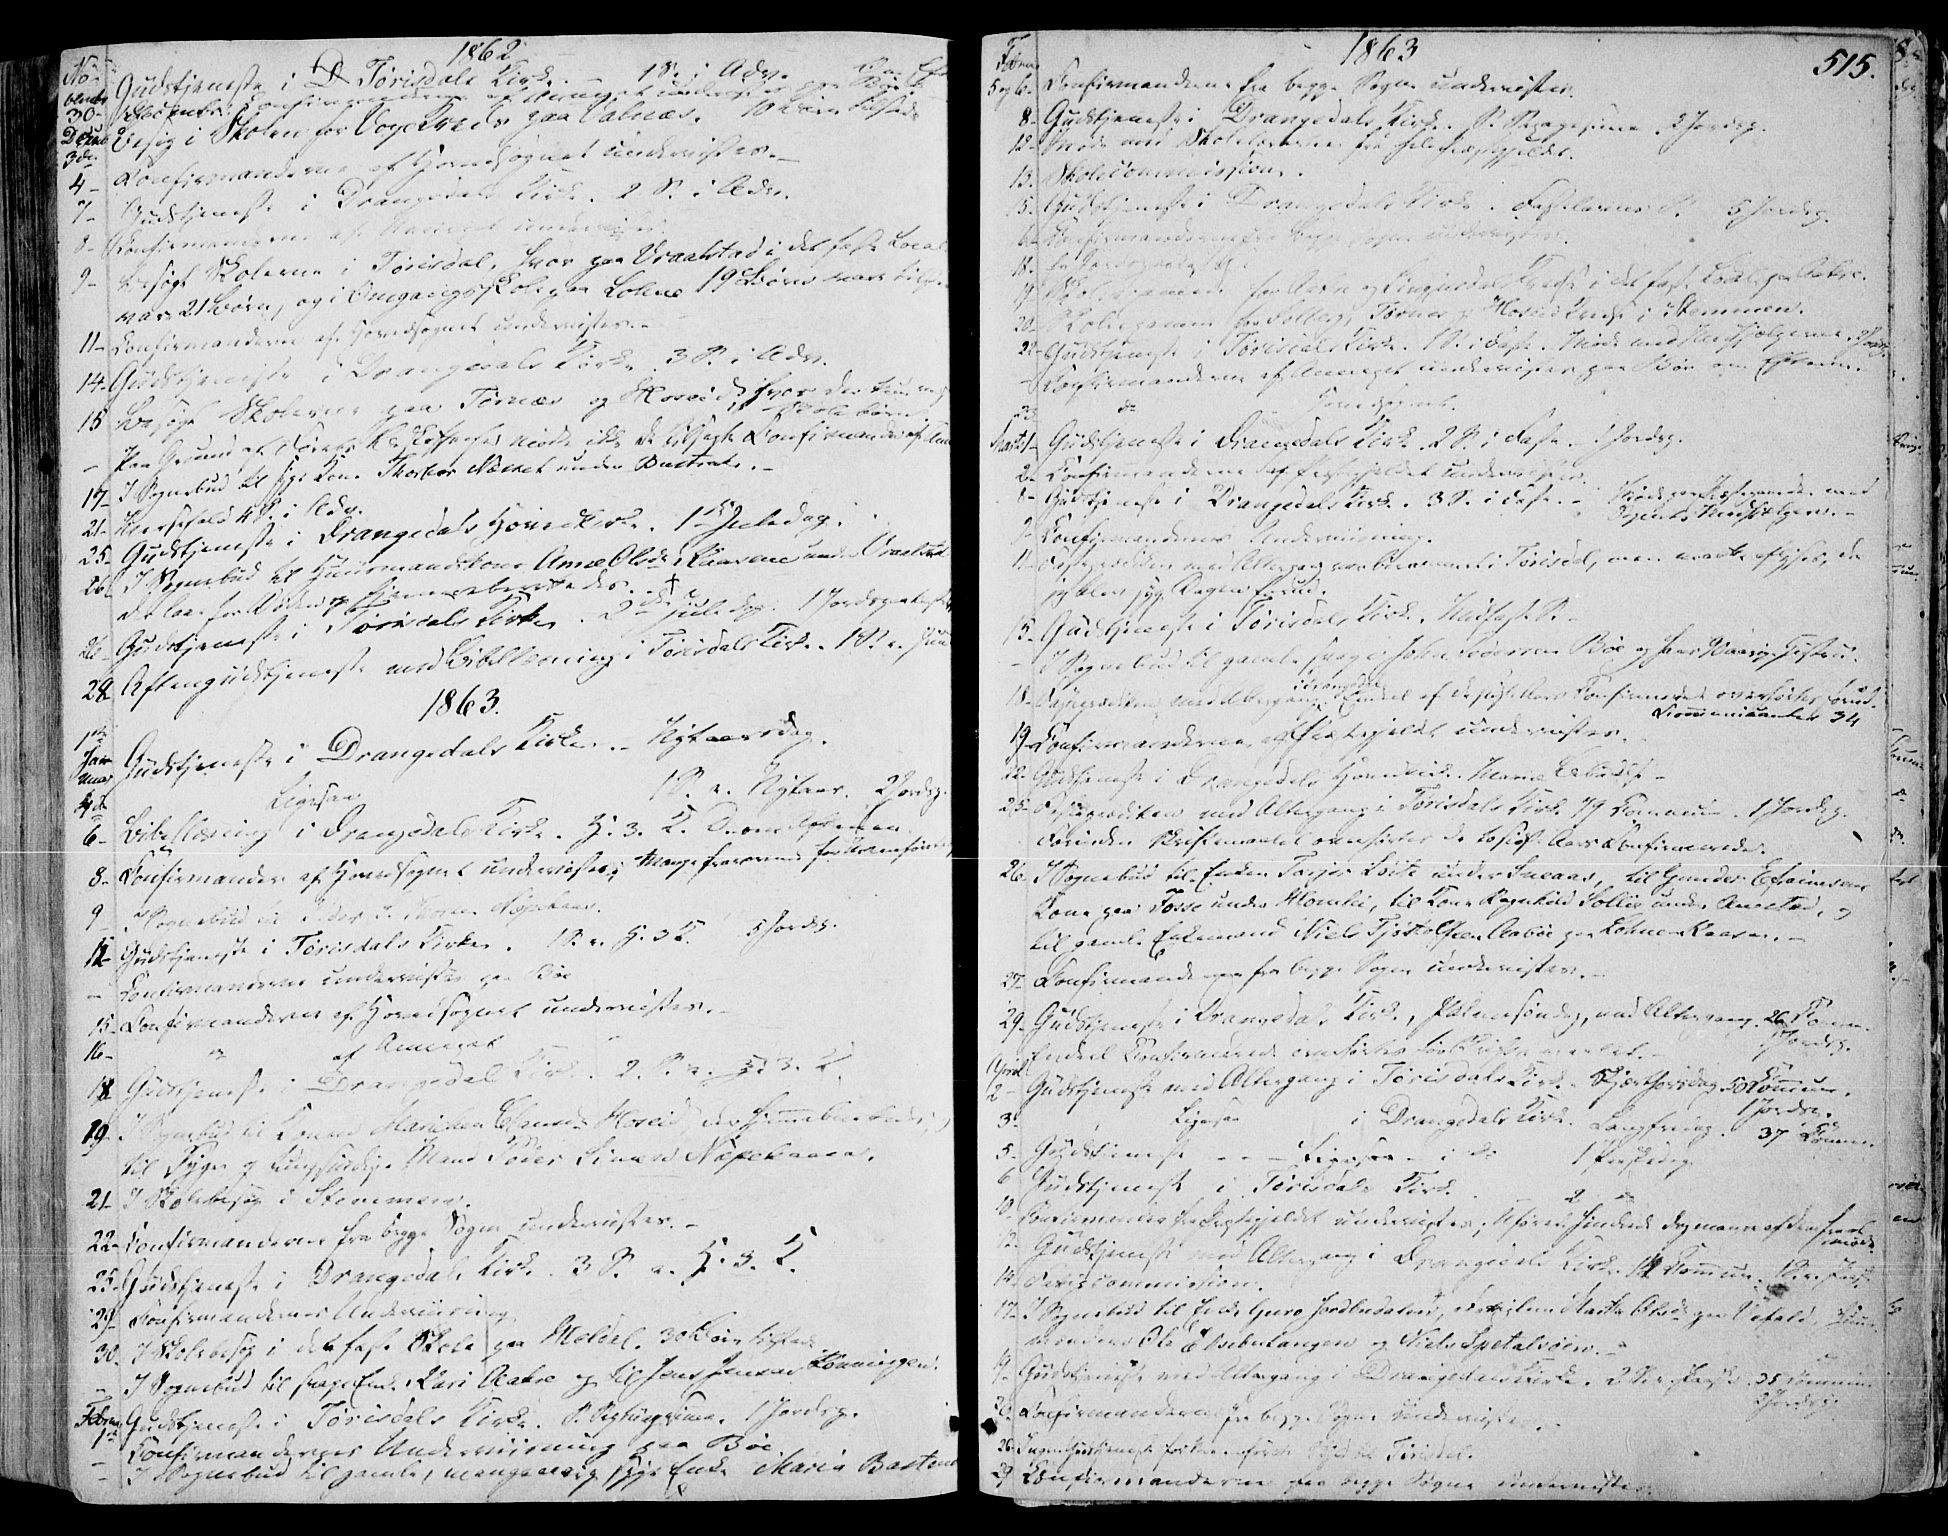 SAKO, Drangedal kirkebøker, F/Fa/L0008: Ministerialbok nr. 8, 1857-1871, s. 515